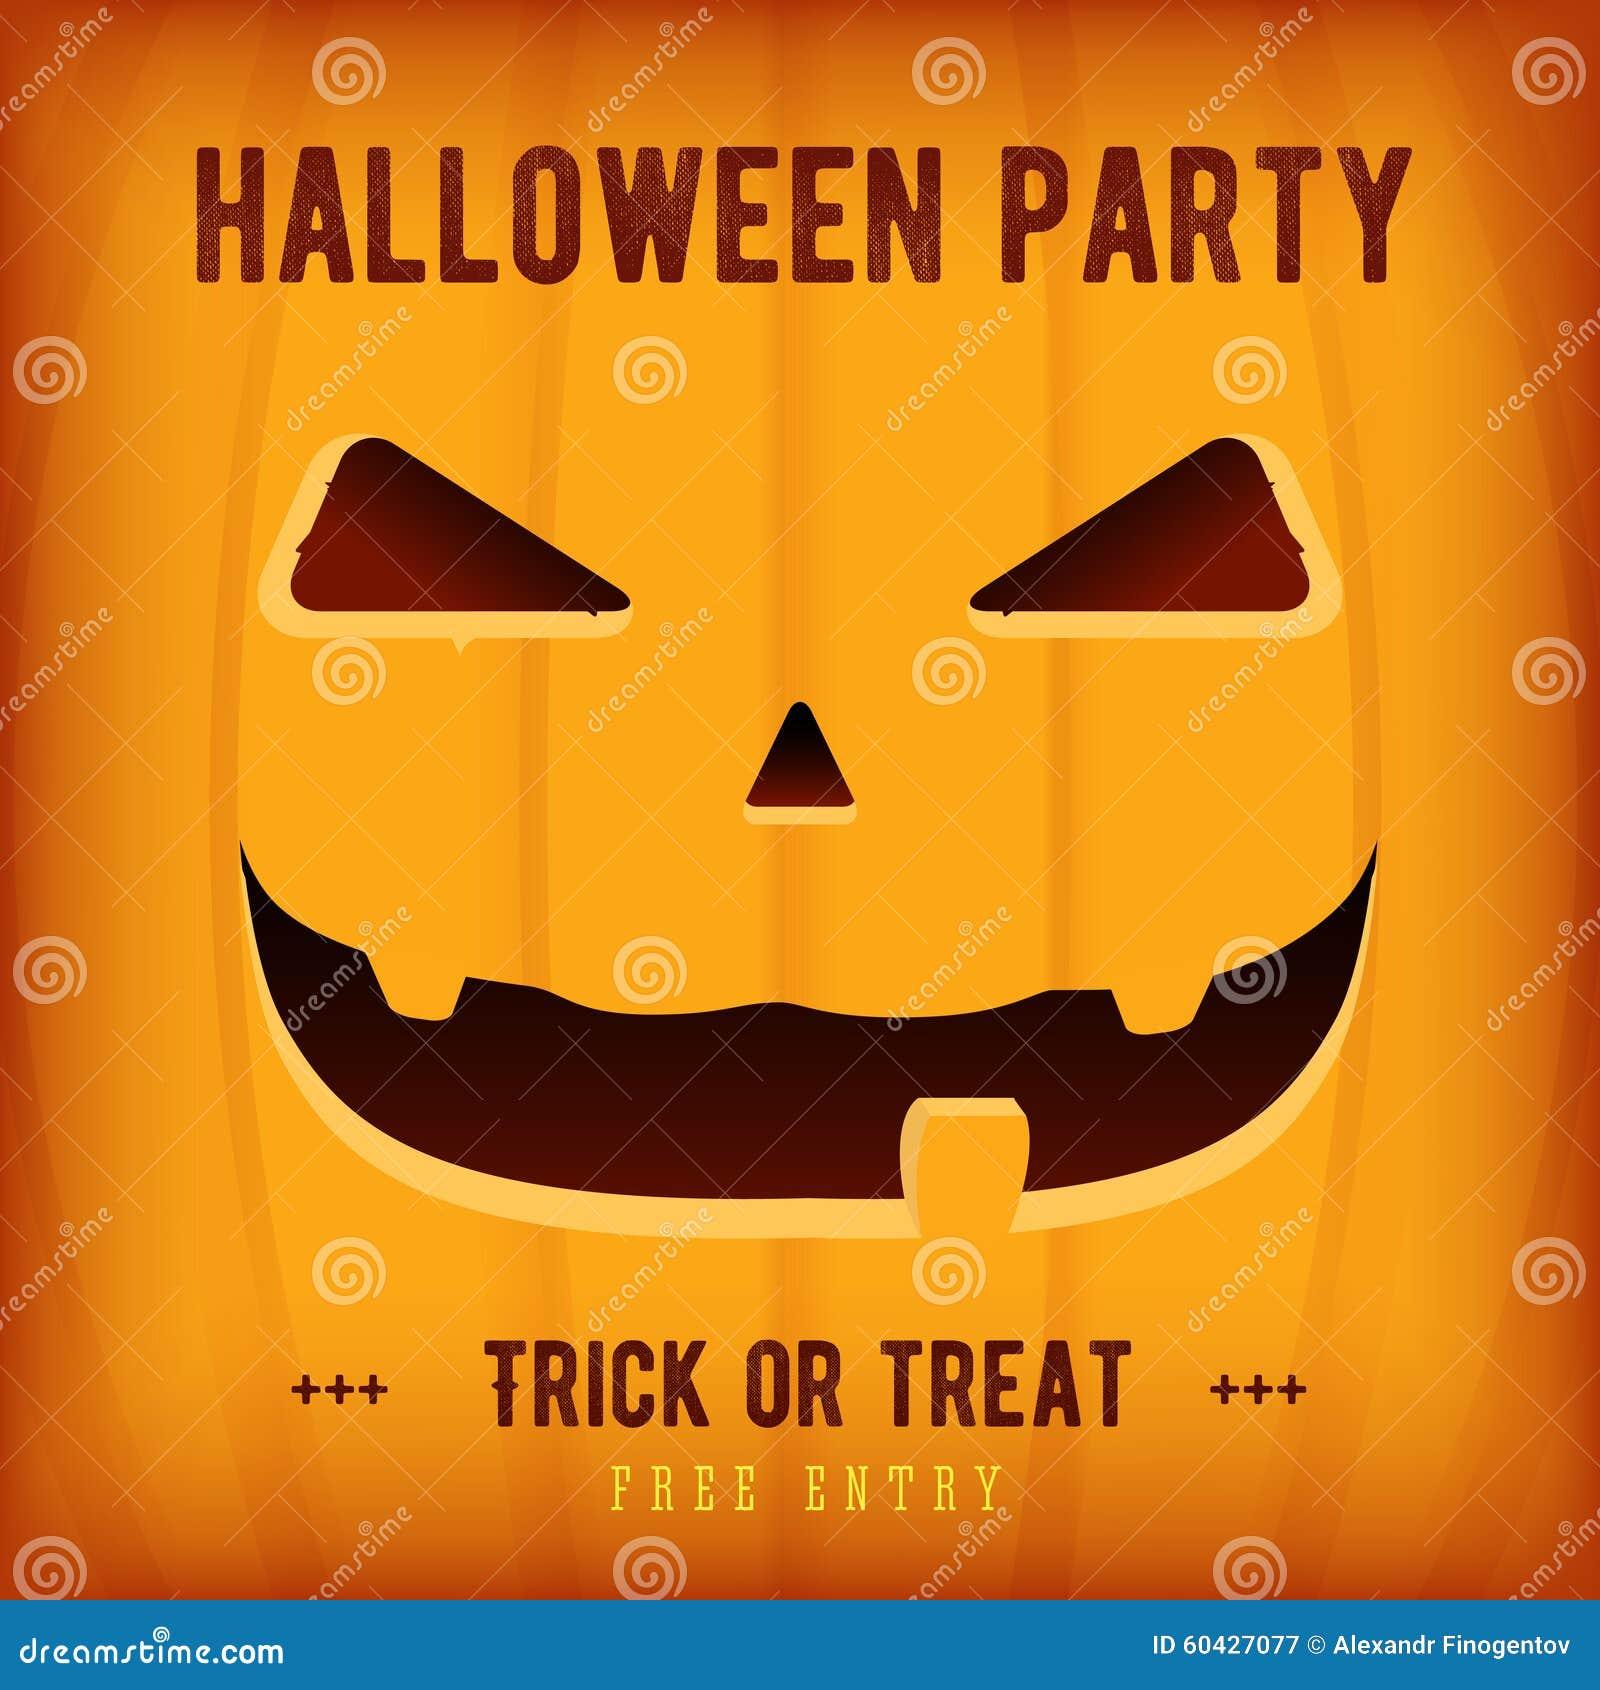 Halloween Party Poster Design Template With Orange Pumpkin Stock ...